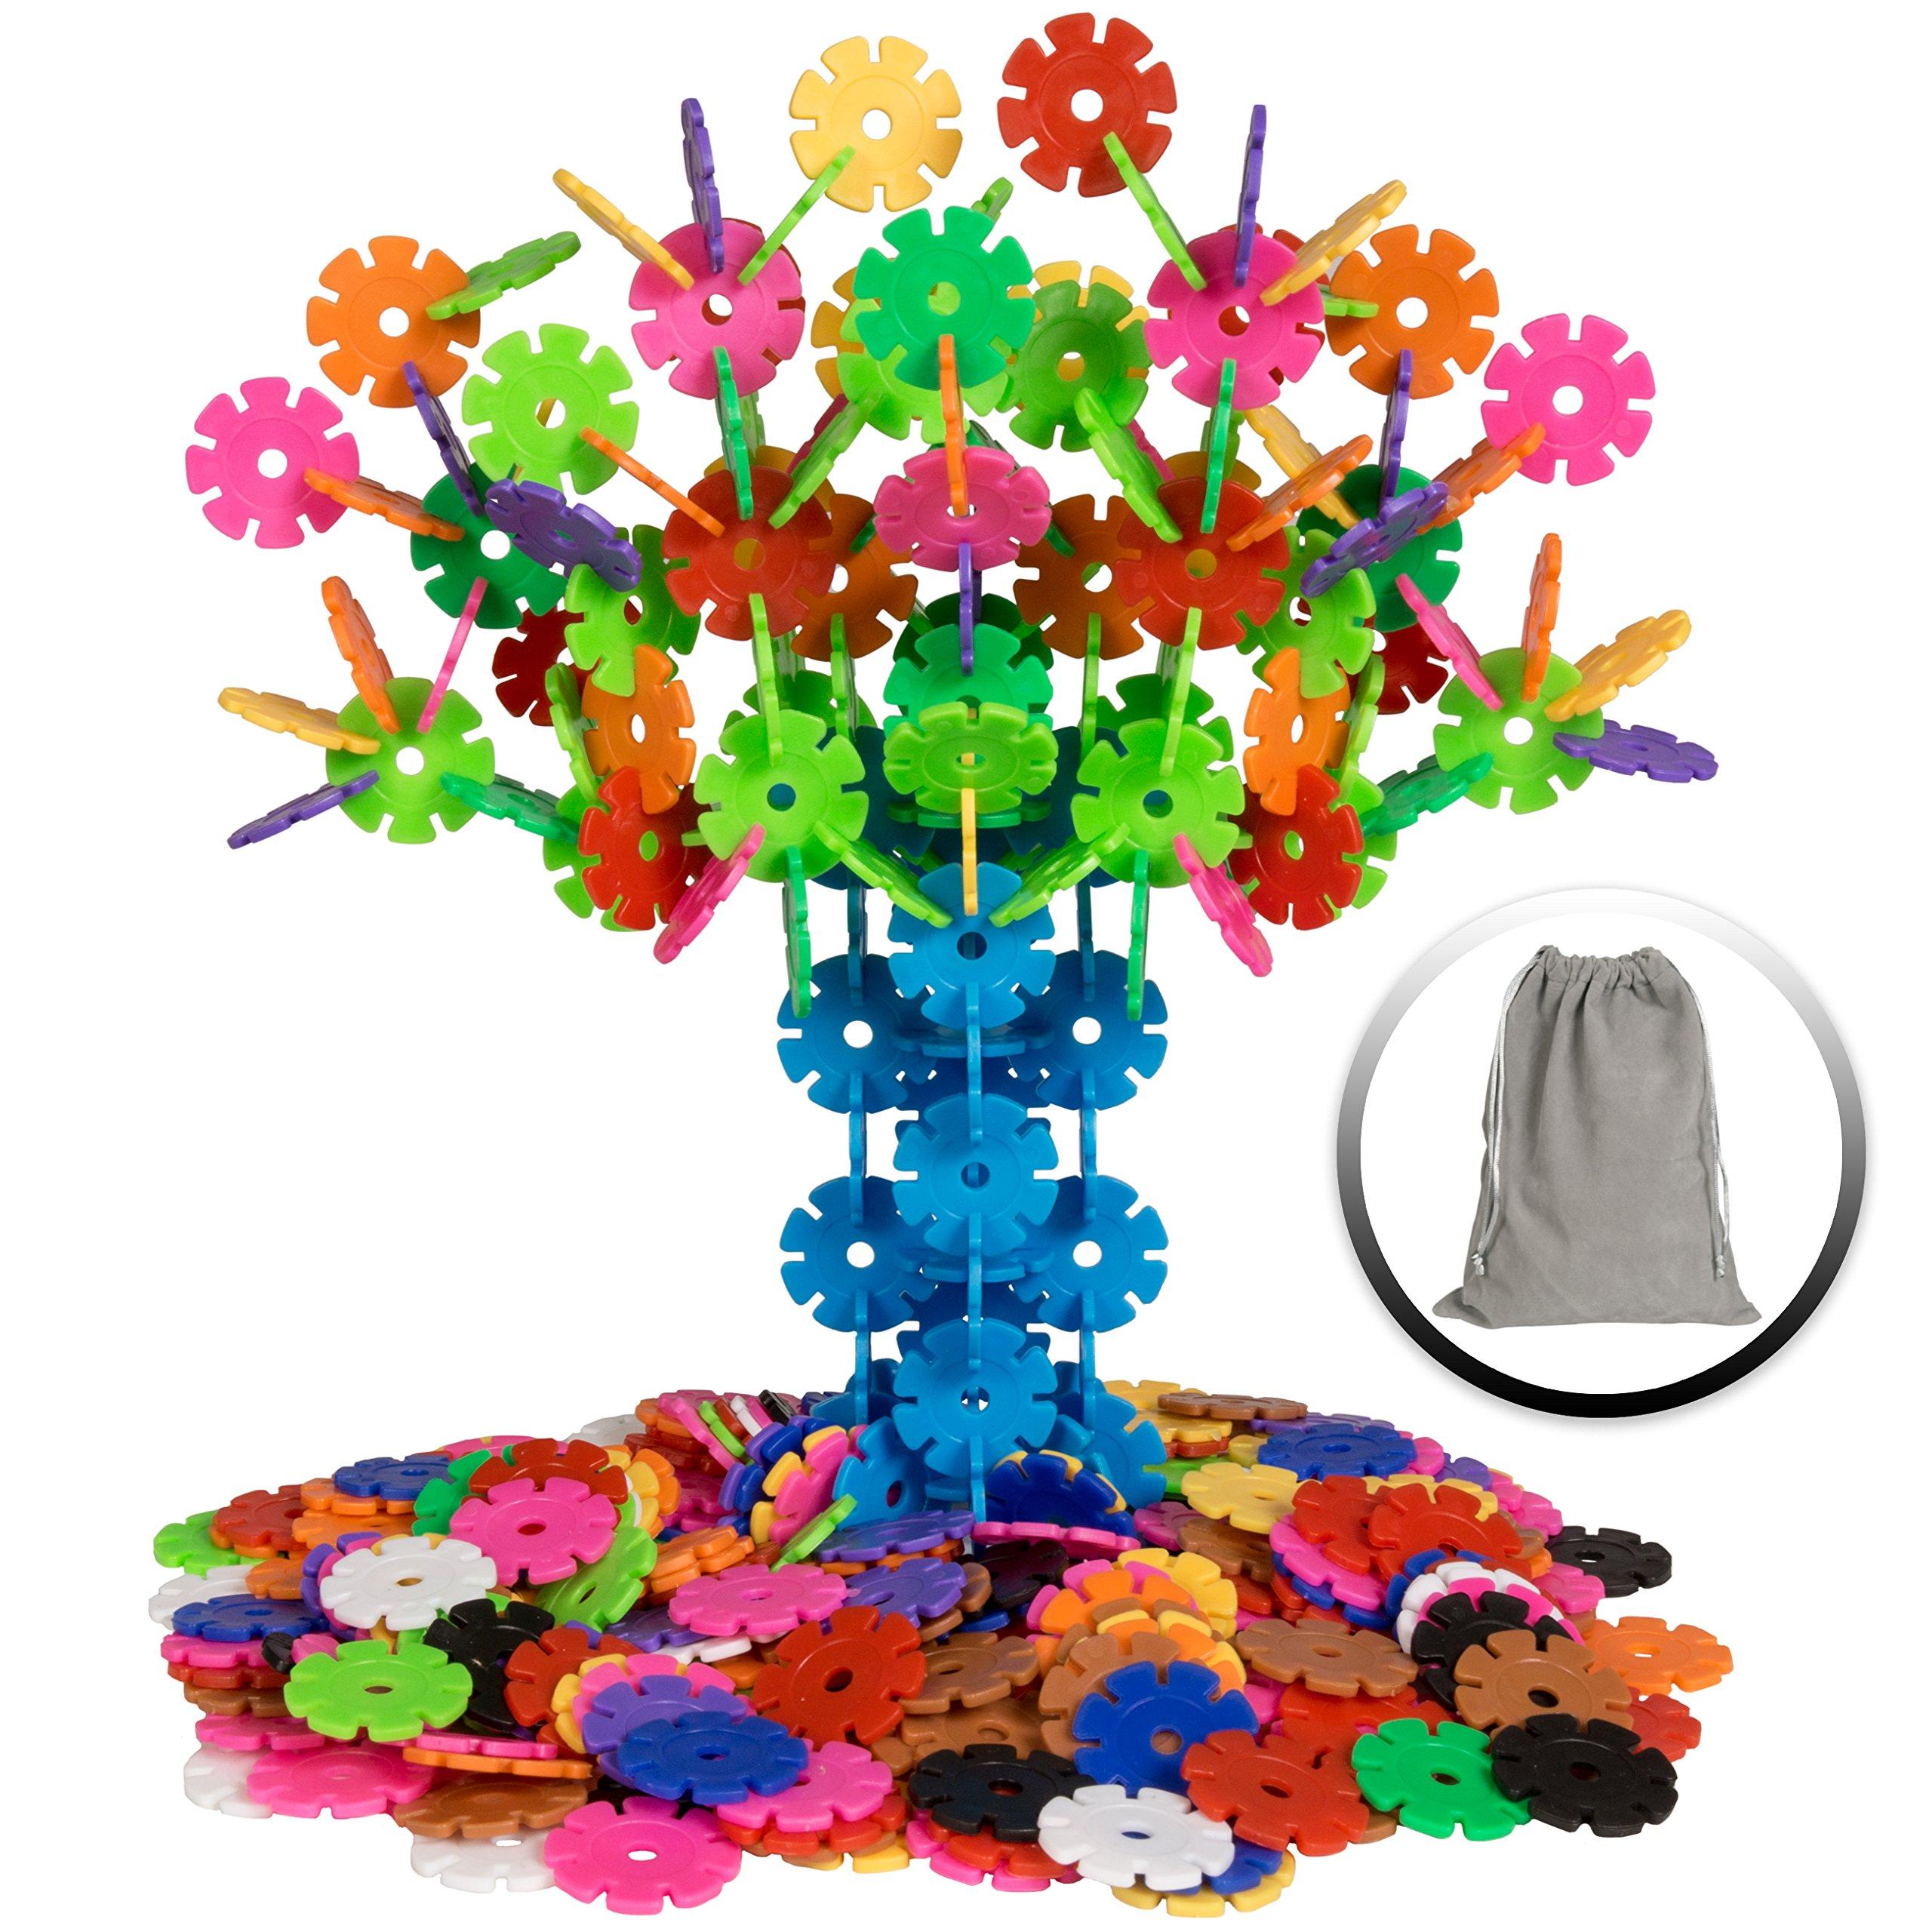 Best Choice Products 360-Piece Kids Educational STEM Toy Plastic Building Block Discs Set w/ Carrying Bag - Multicolor